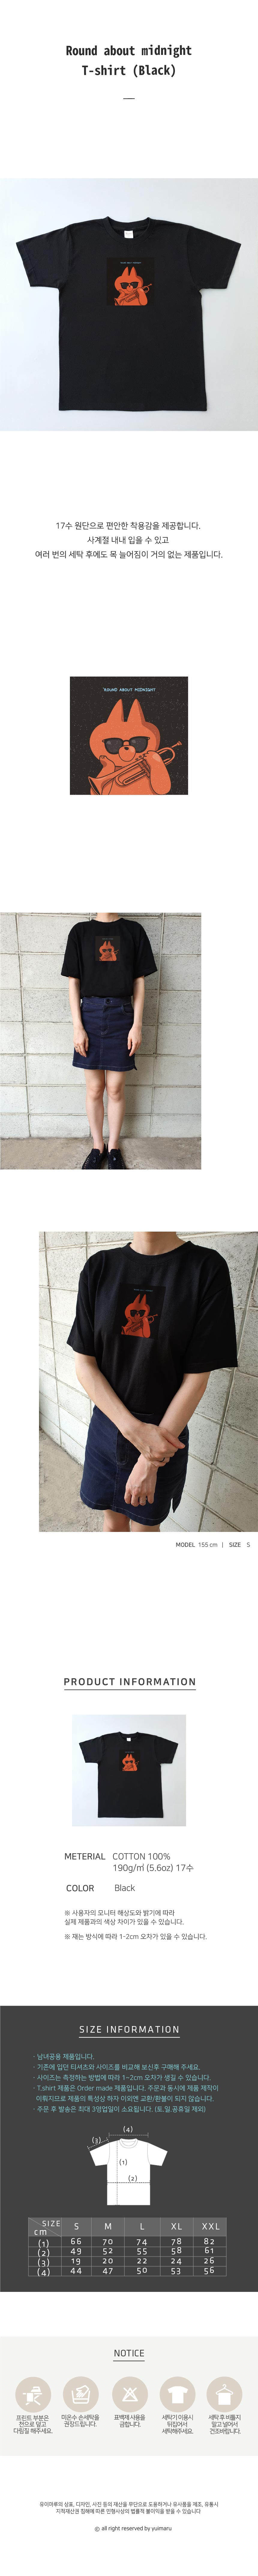 Round about midnight T-shirt (black) - 유이마루, 22,500원, 상의, 반팔티셔츠